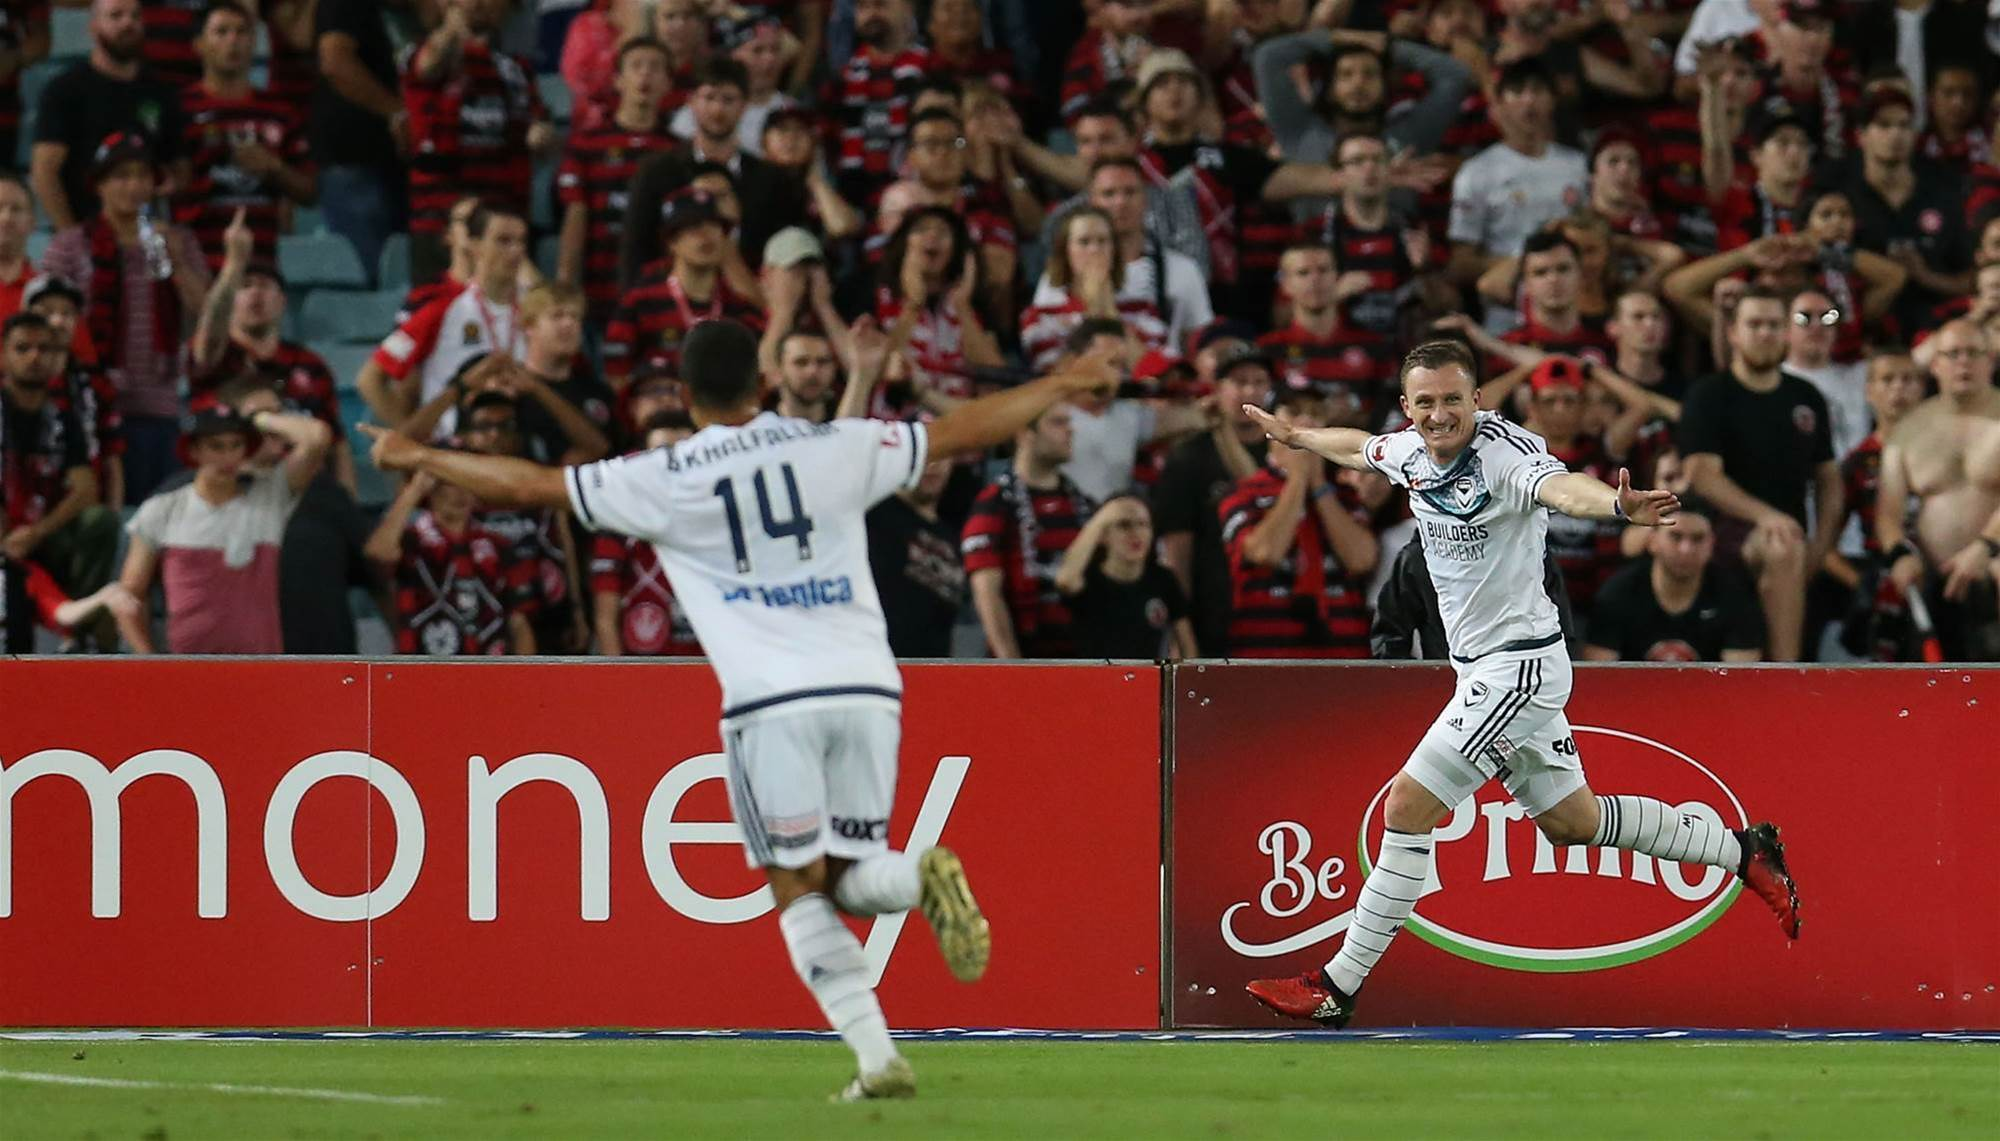 Berisha hat-trick blows away Wanderers